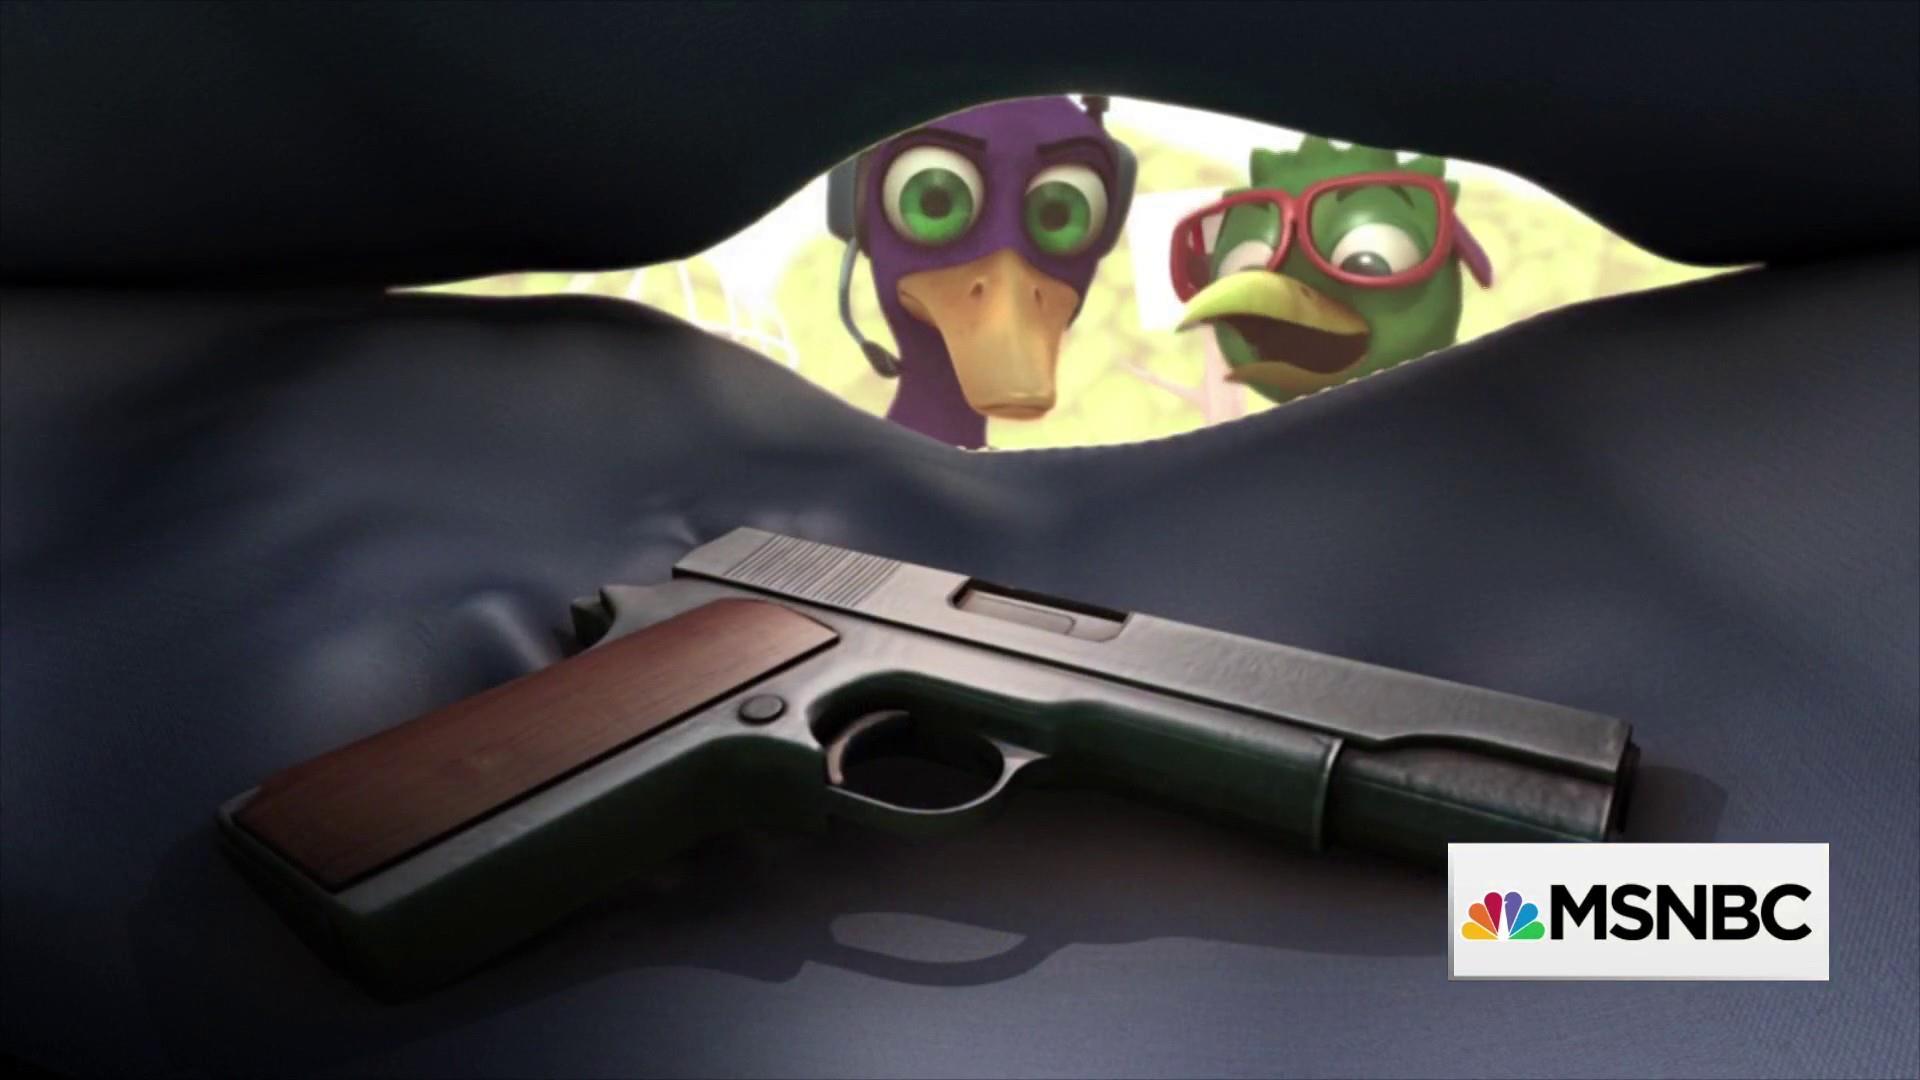 Will America ever implement common sense gun laws?